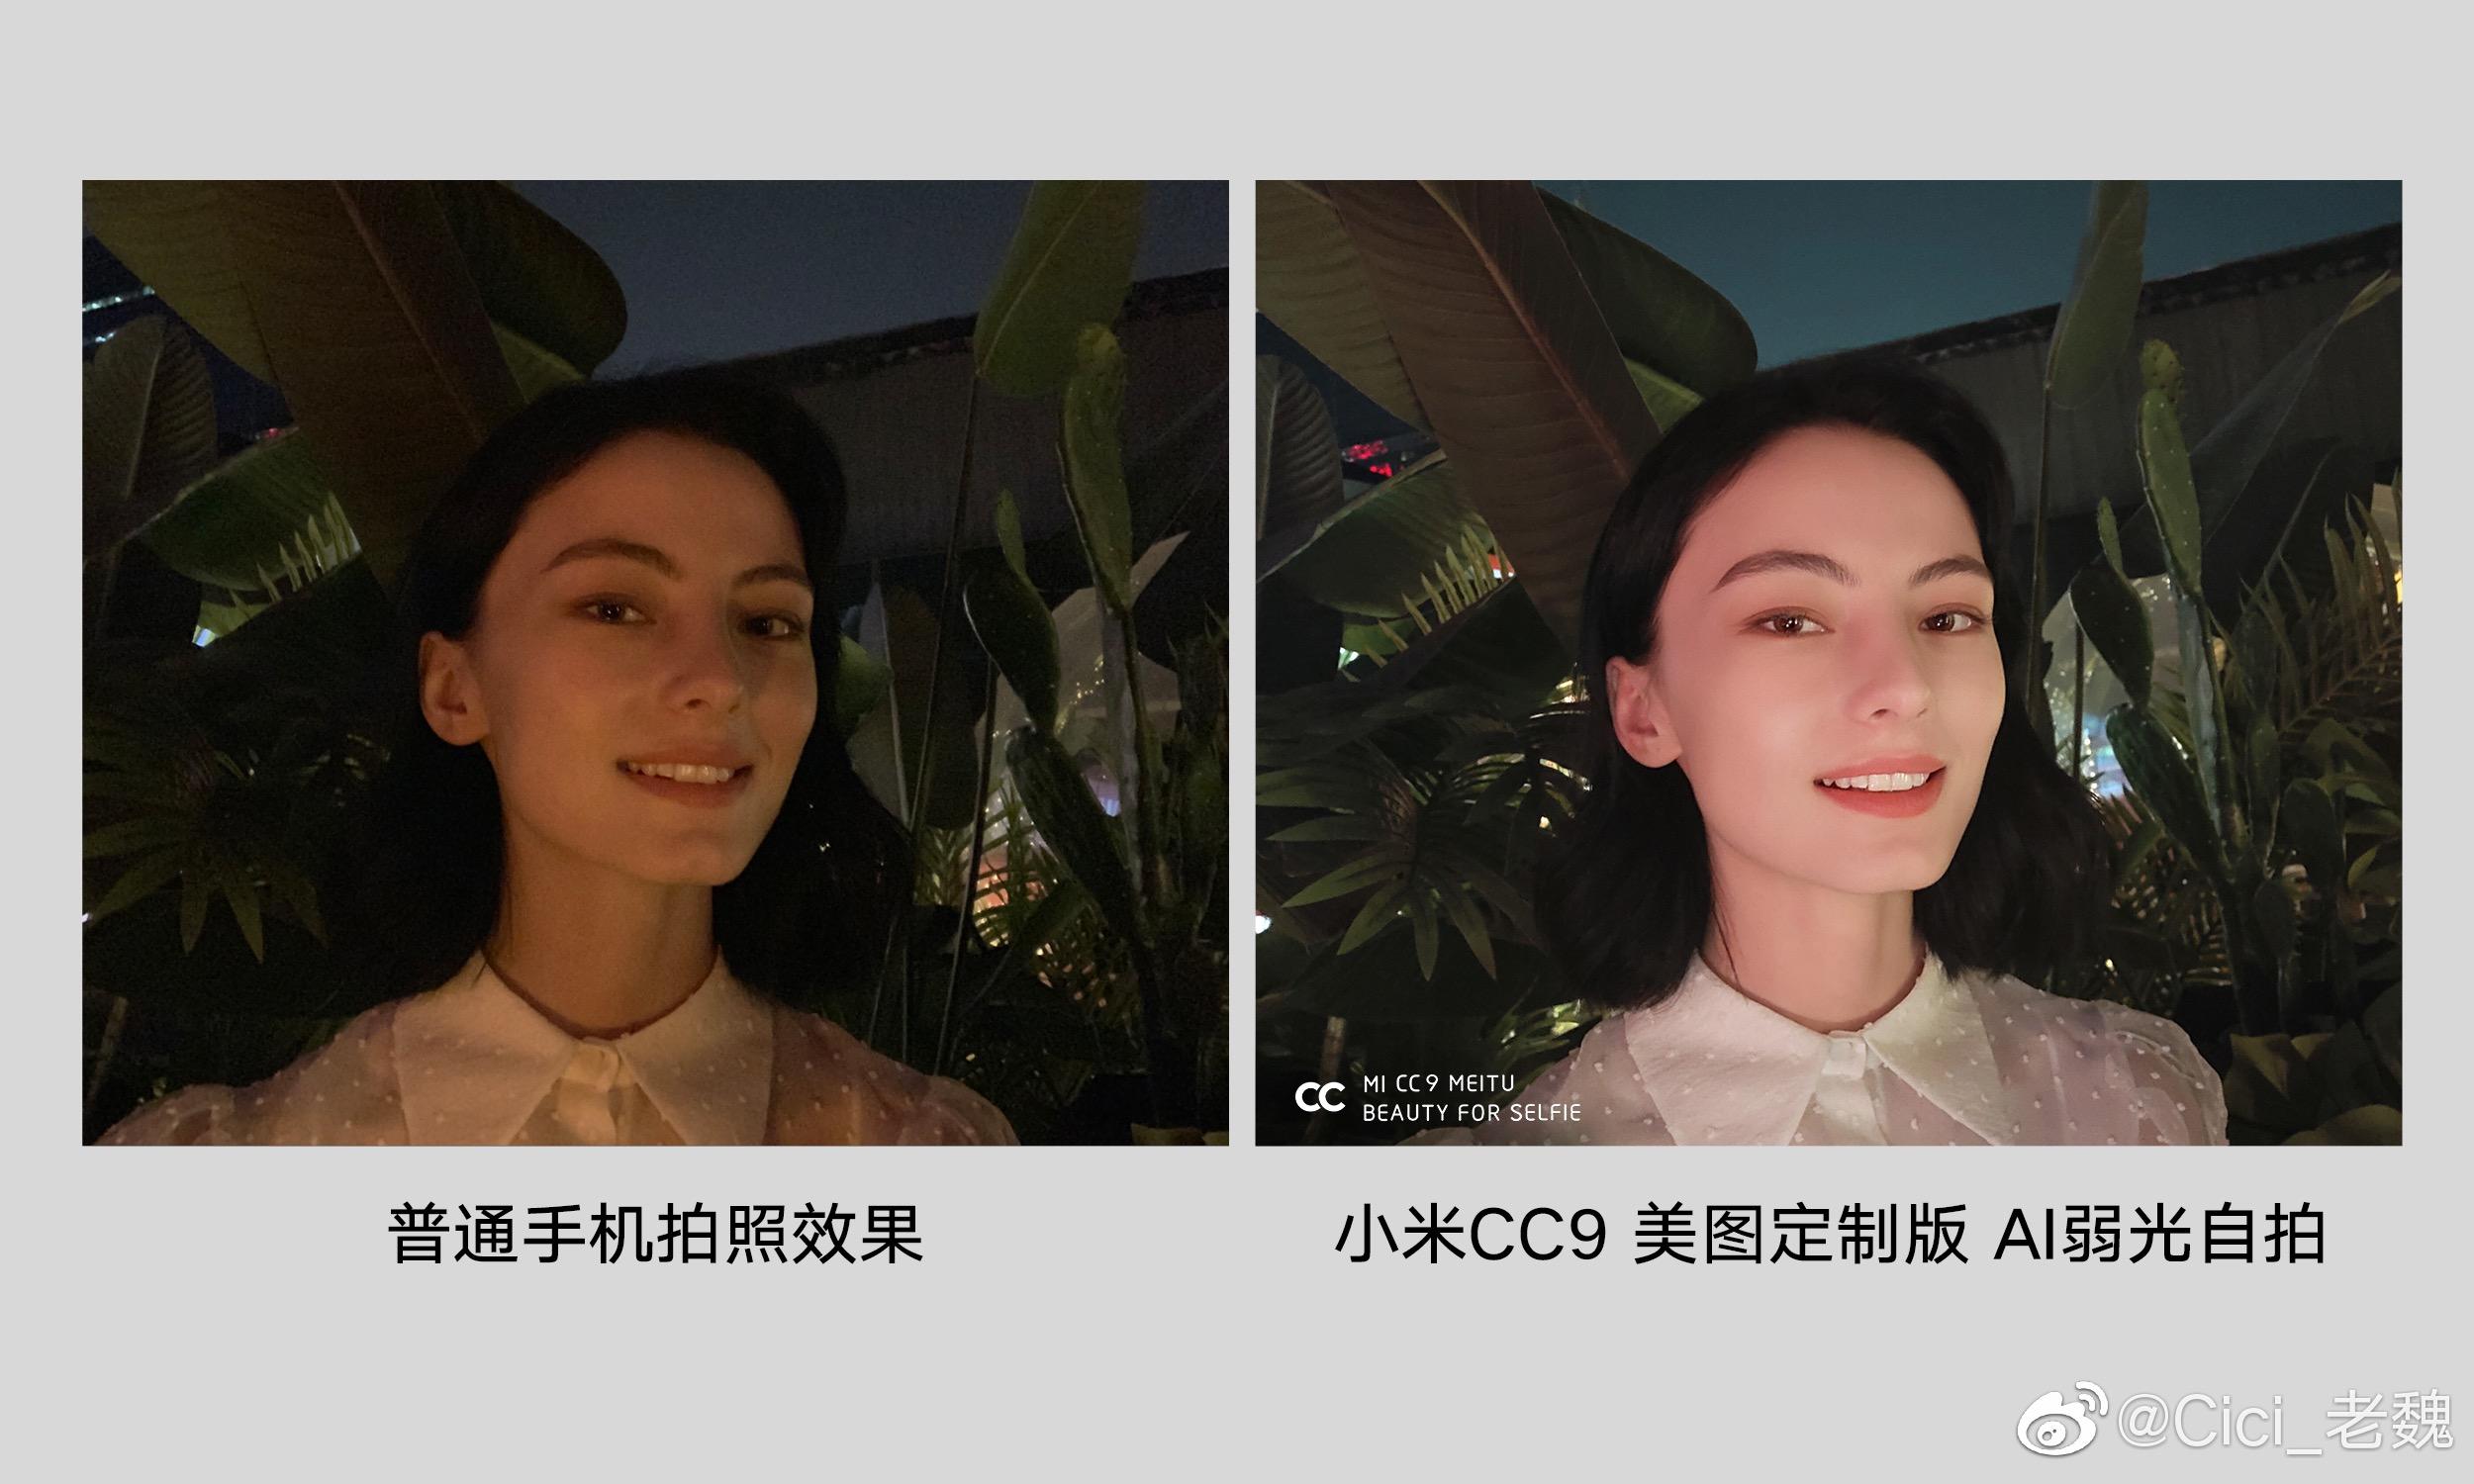 Meitu Beauty For Selfie. Noticias Xiaomi Adictos